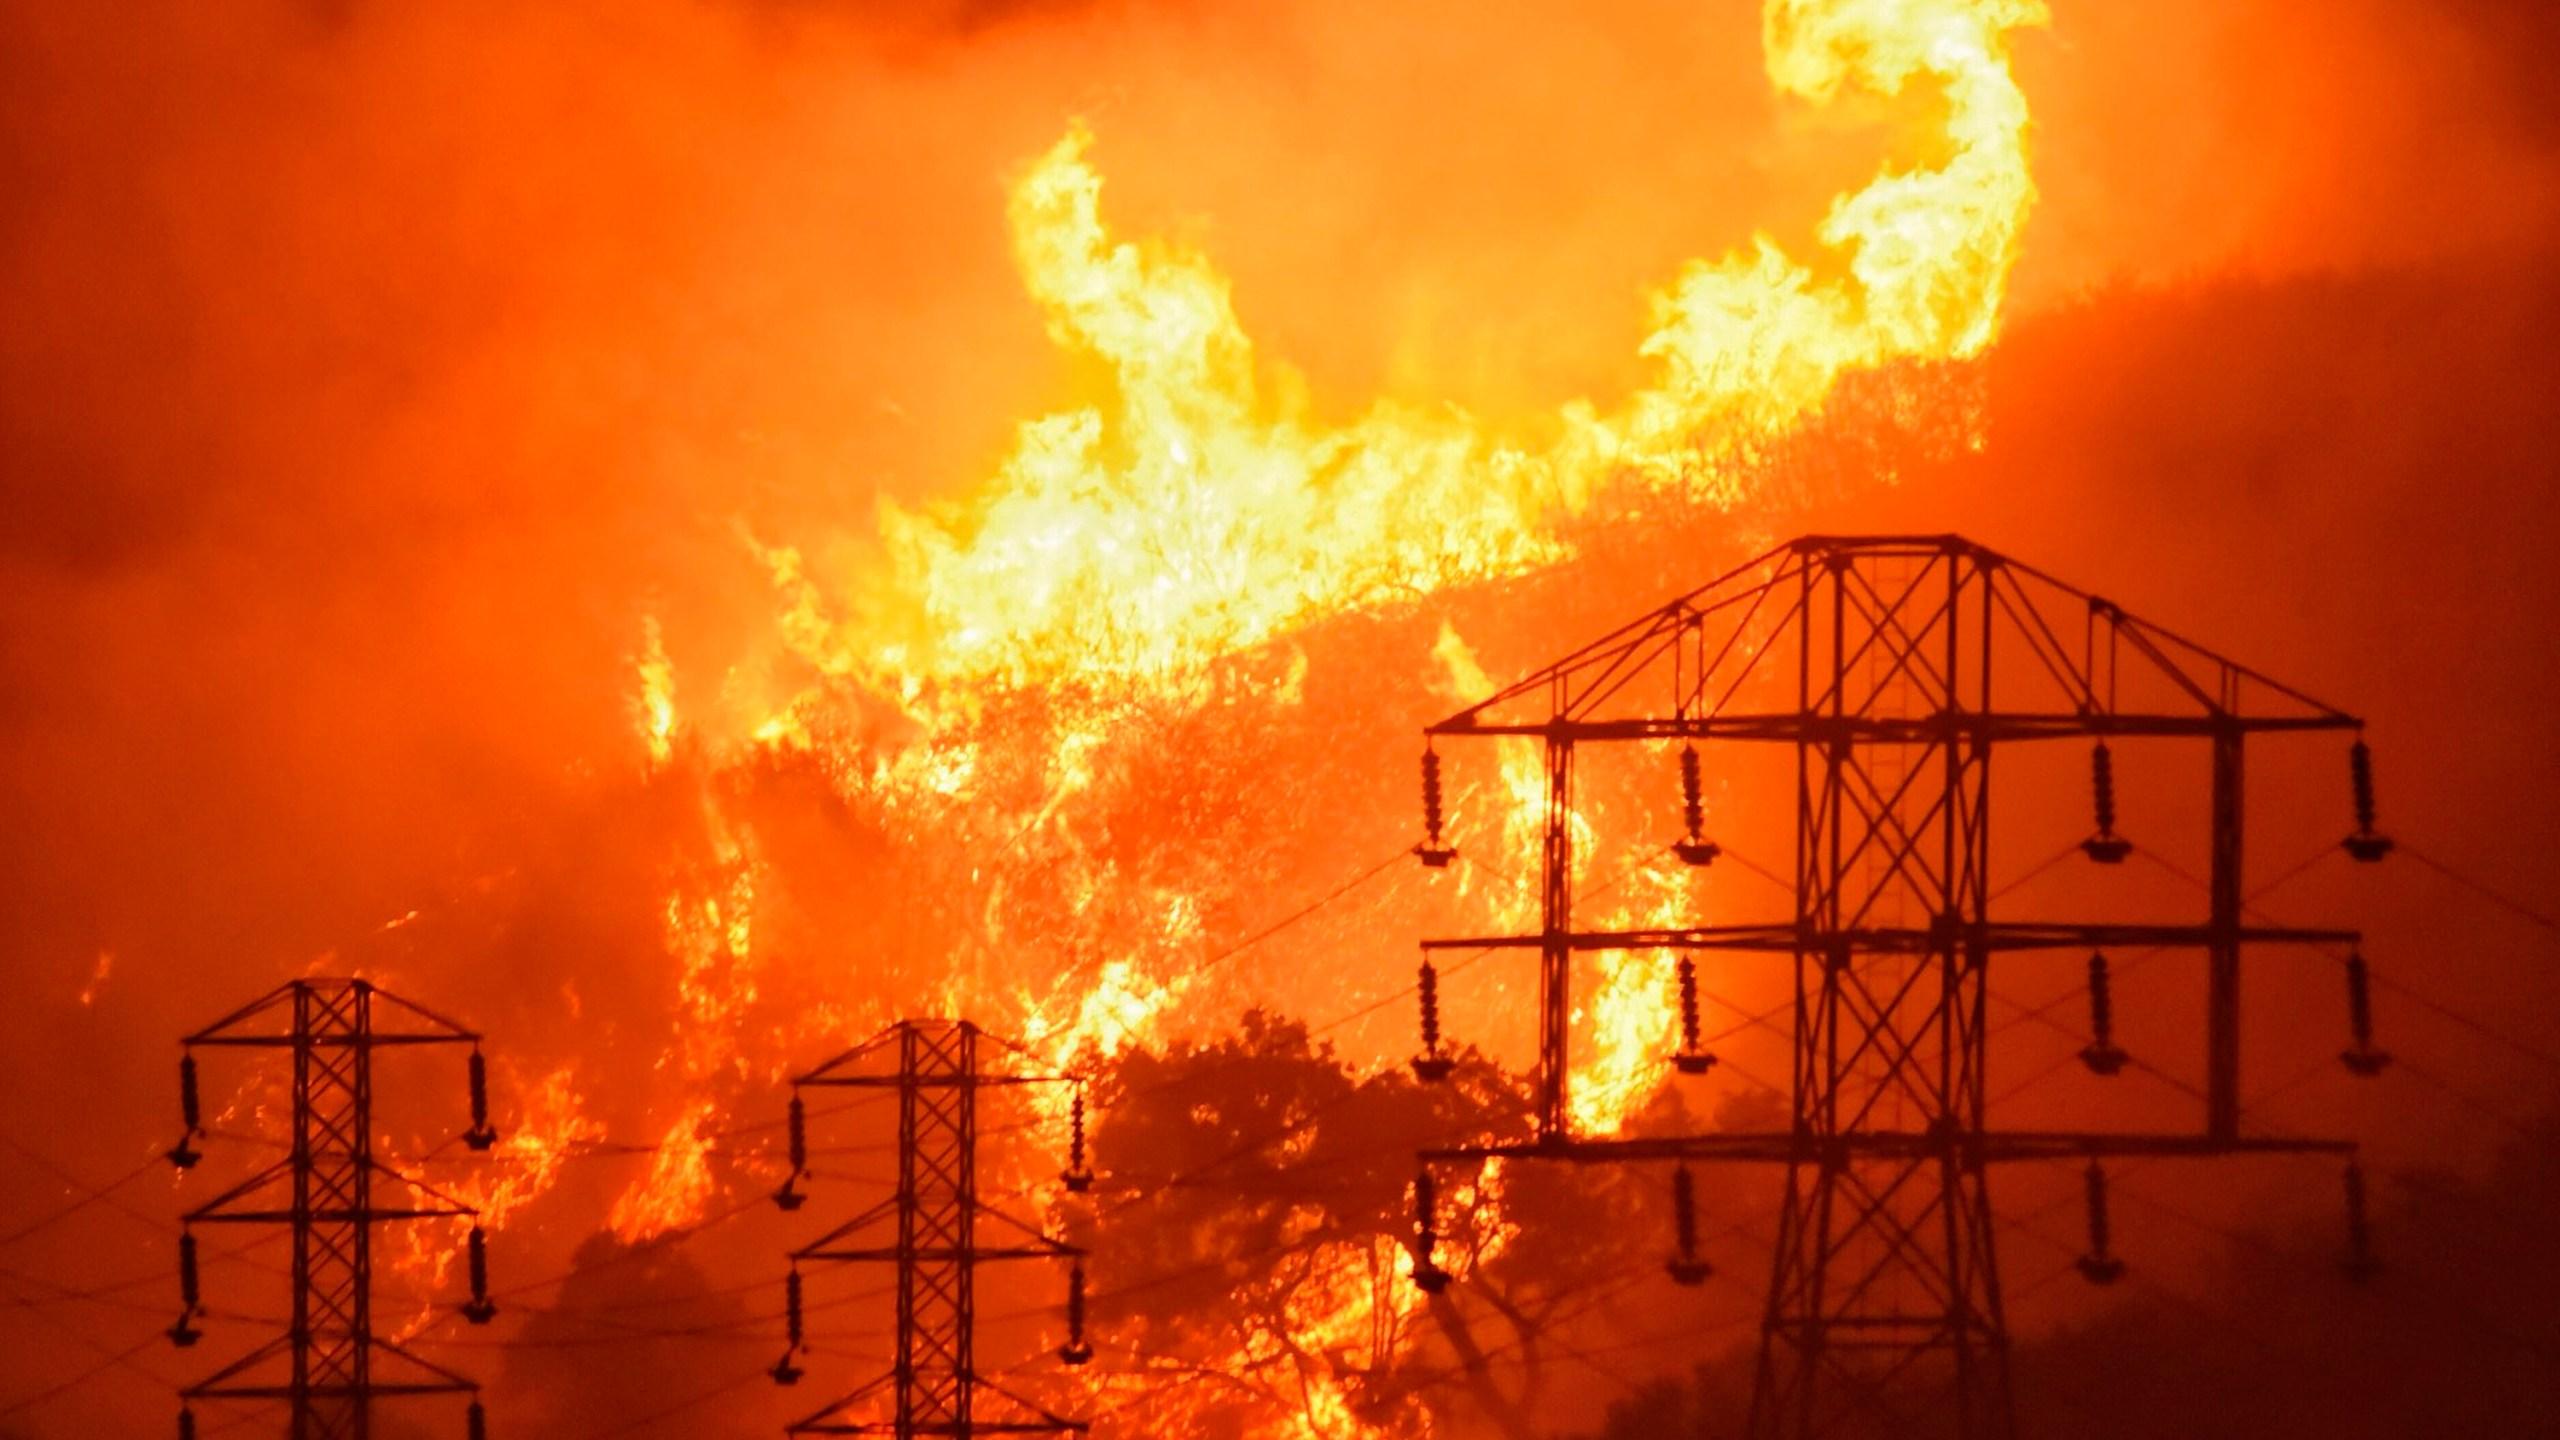 California_Wildfire_Utility_50638-159532.jpg08267009